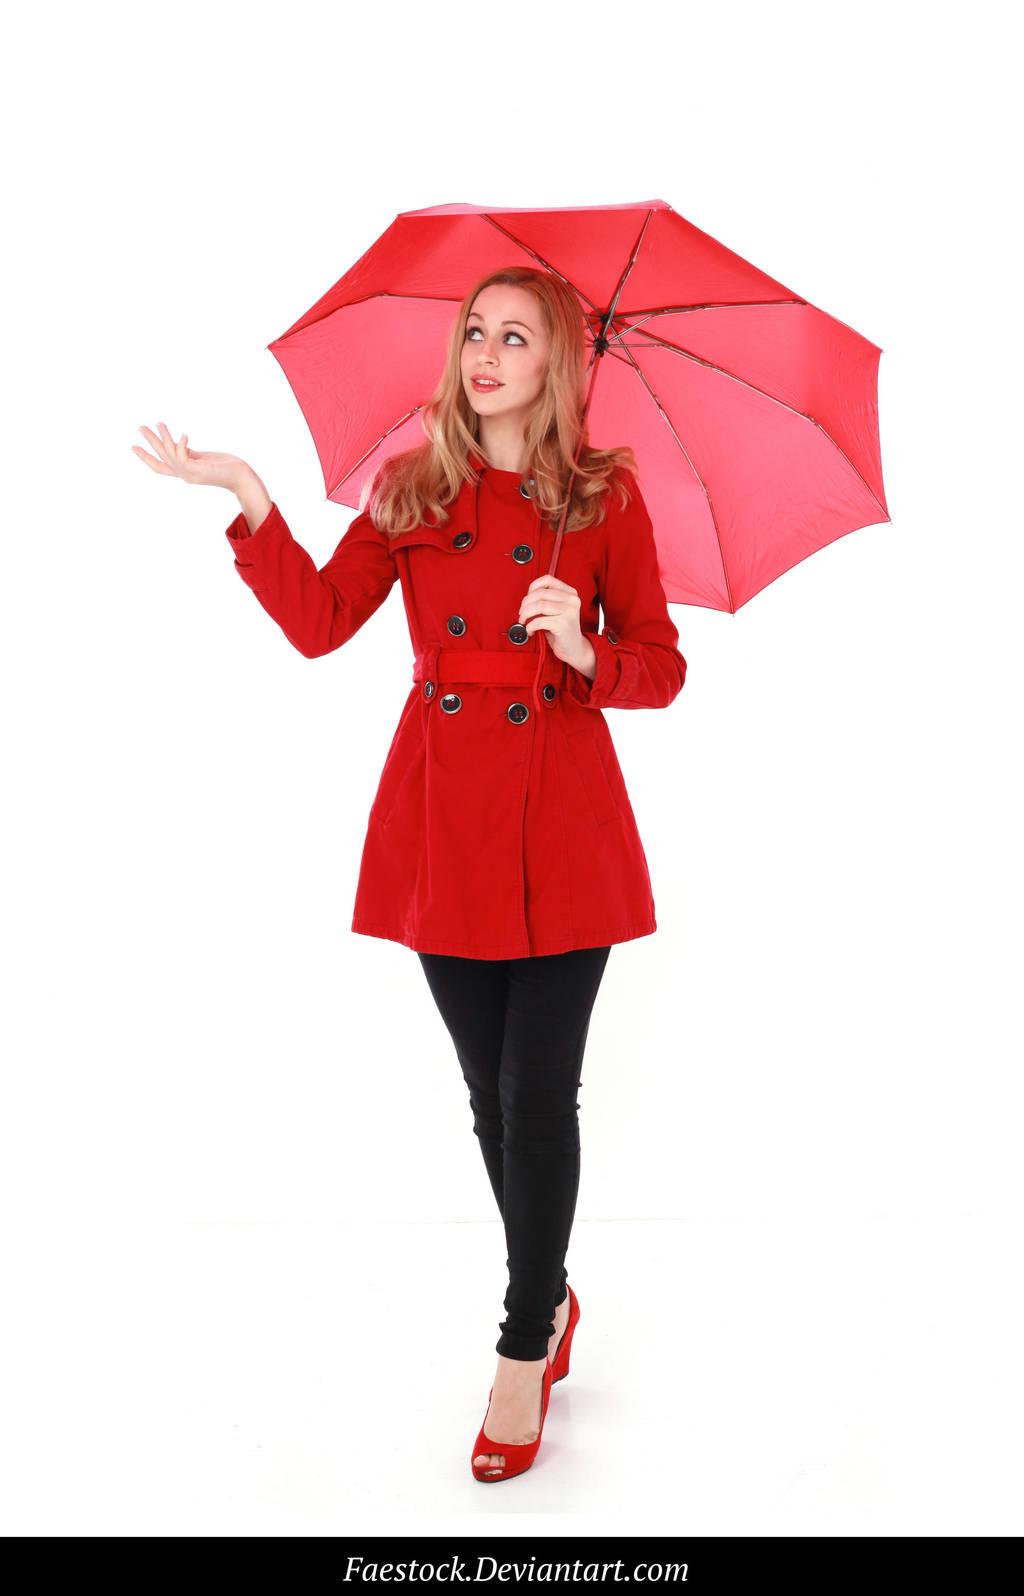 Rainy Days -  model stock reference 5 by faestock